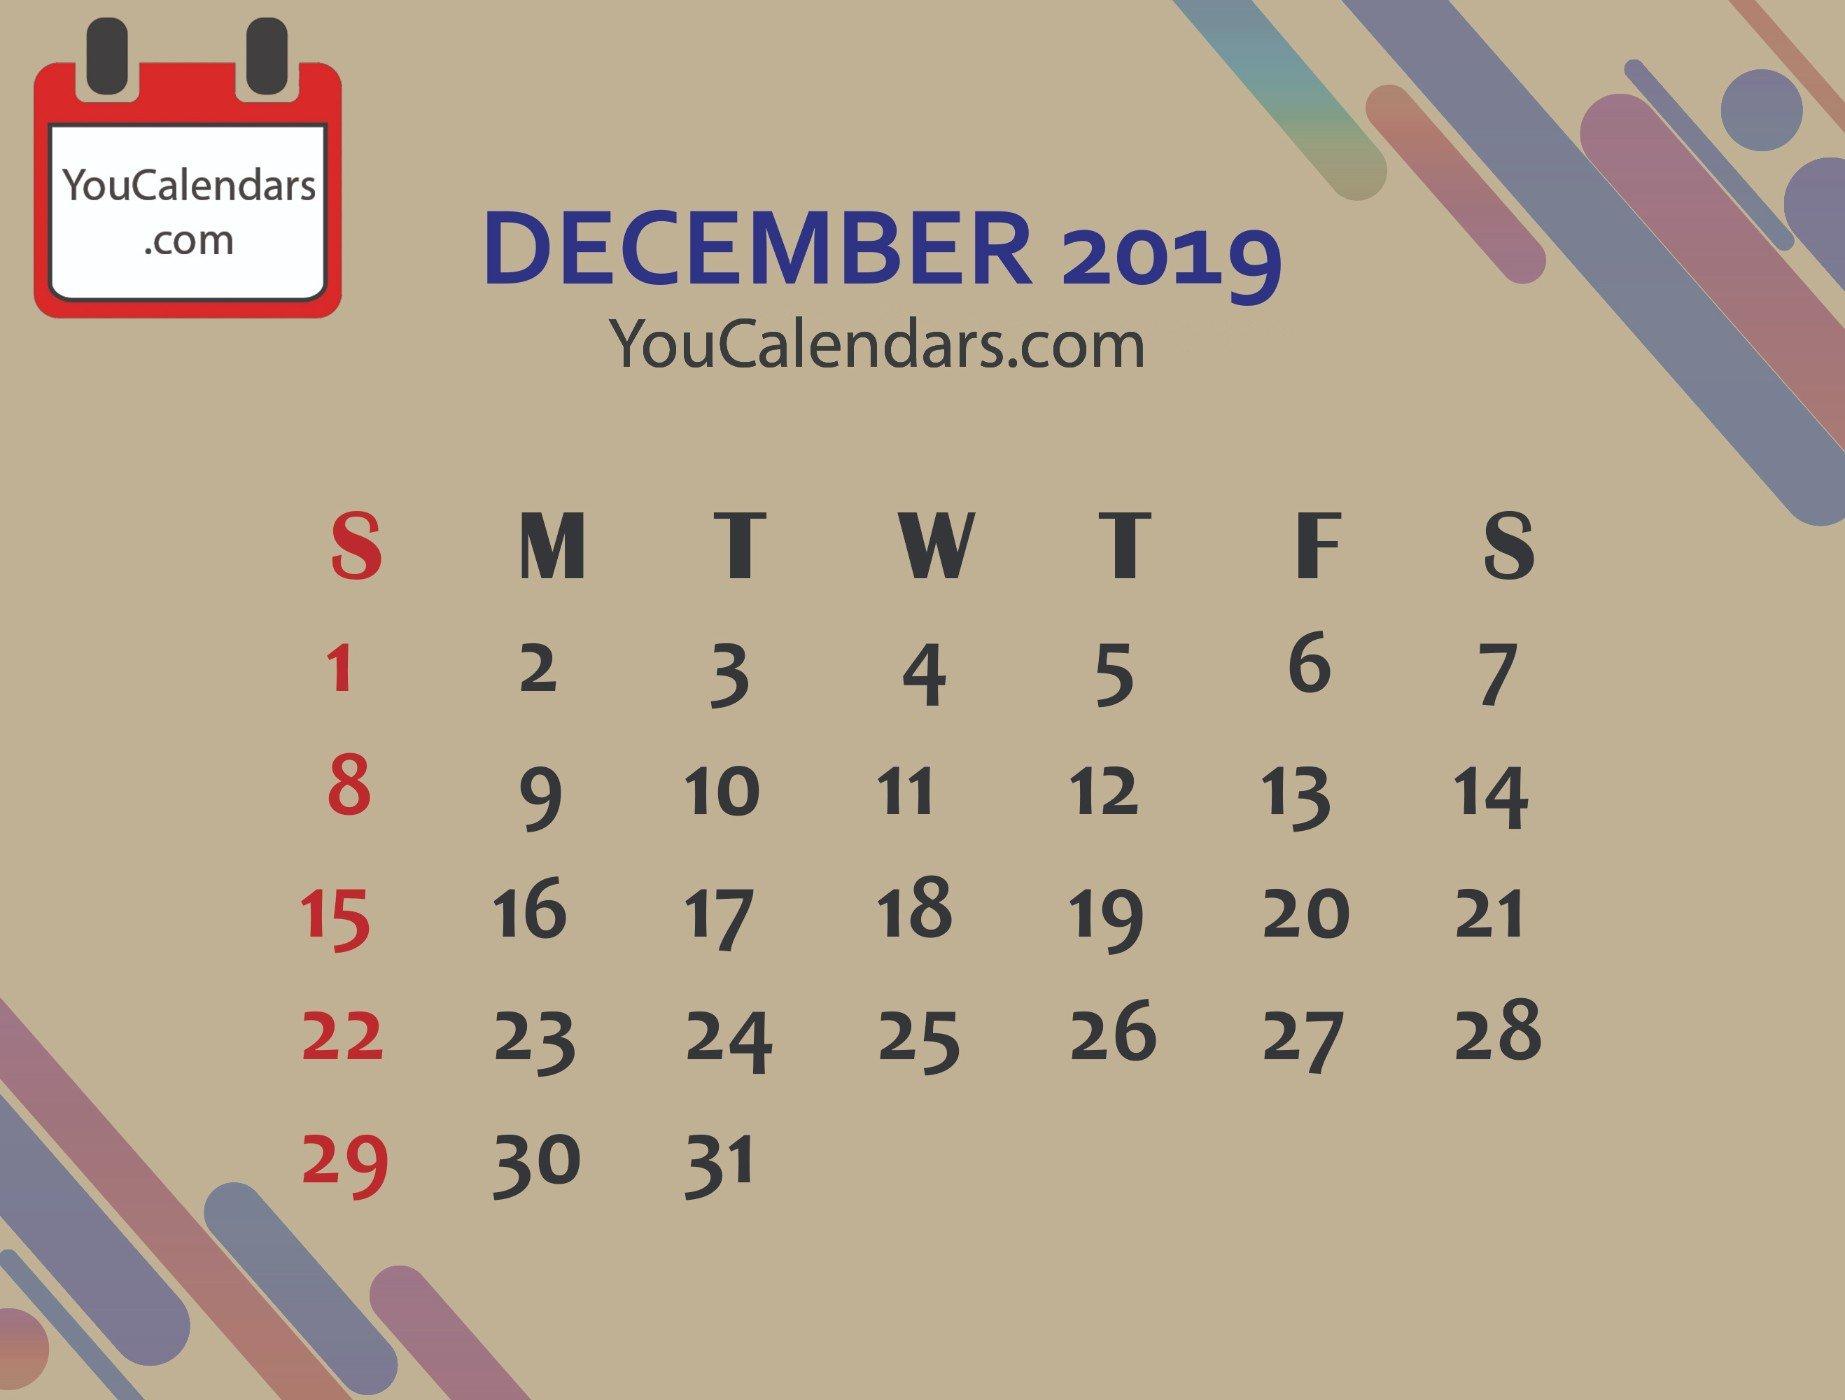 ✅Free December 2019 Calendar Printable Template – You Calendars 6 Nations 2019 Calendar Download